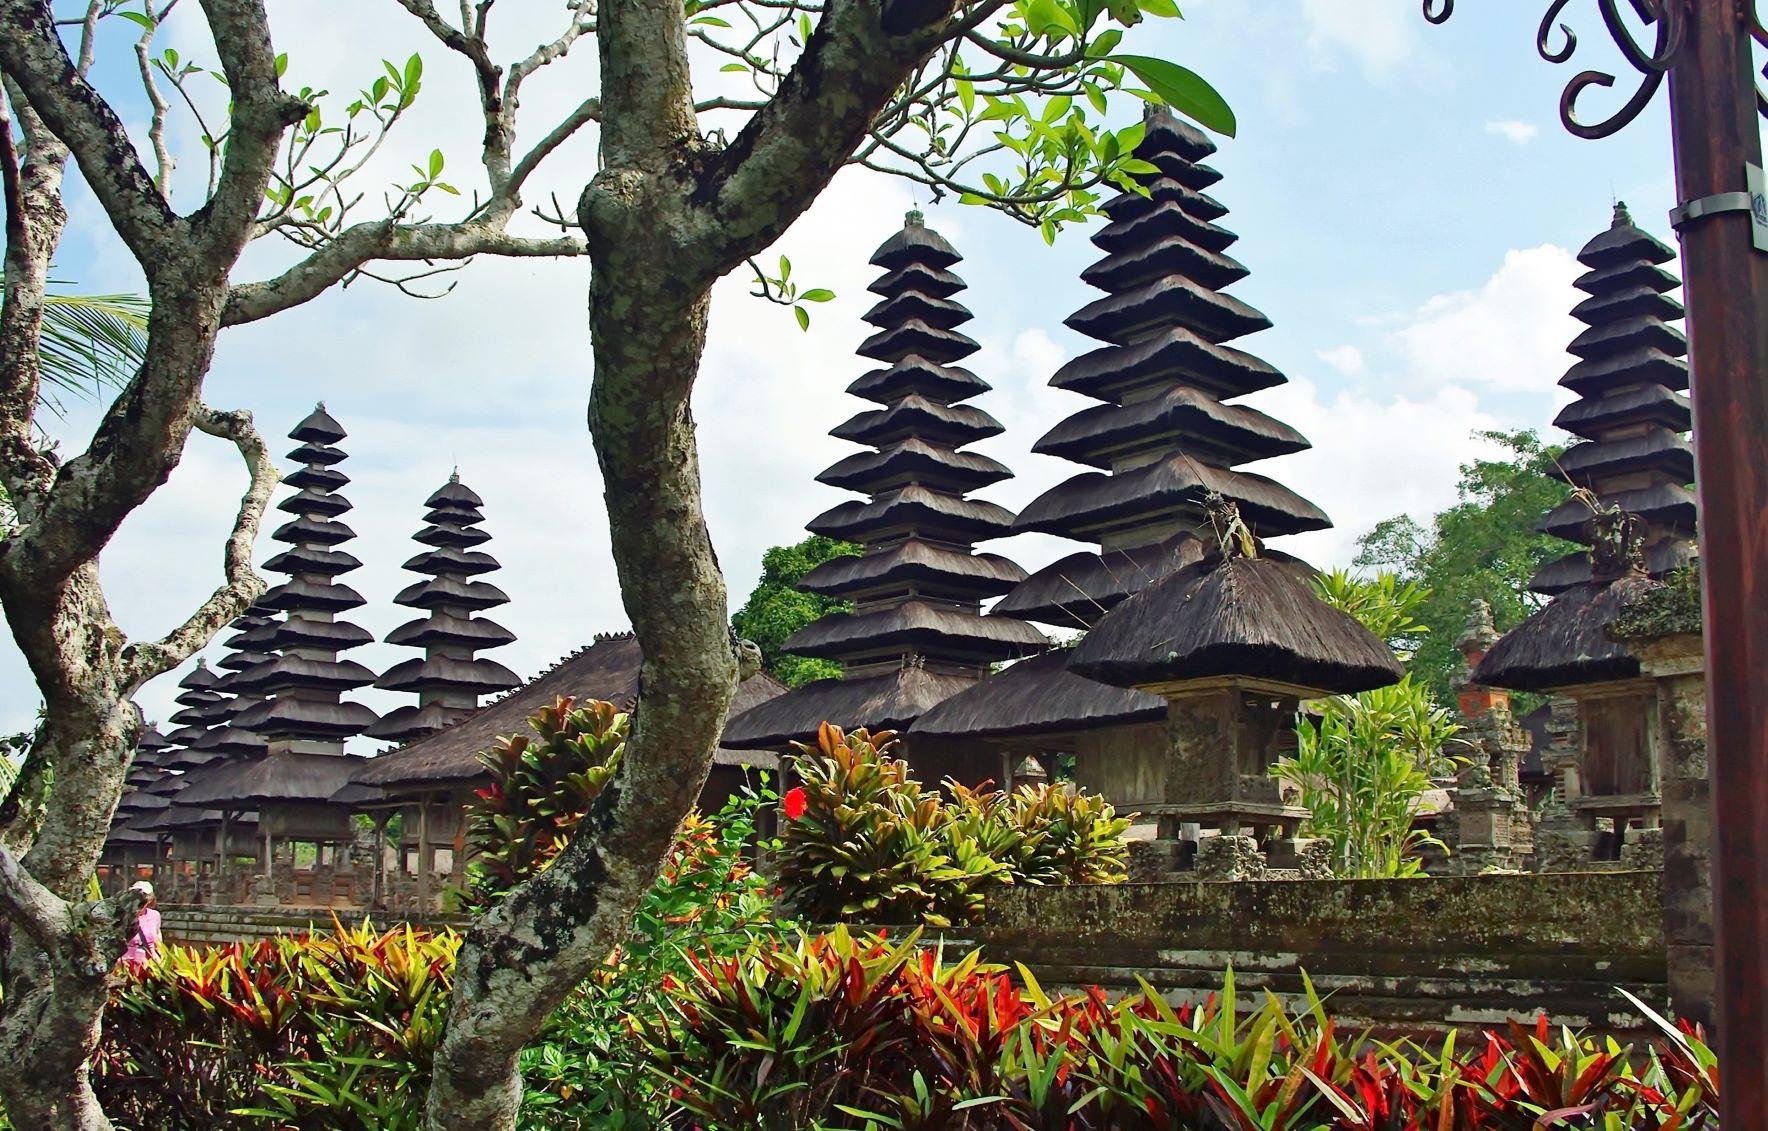 15-daagse rondreis naar Bali